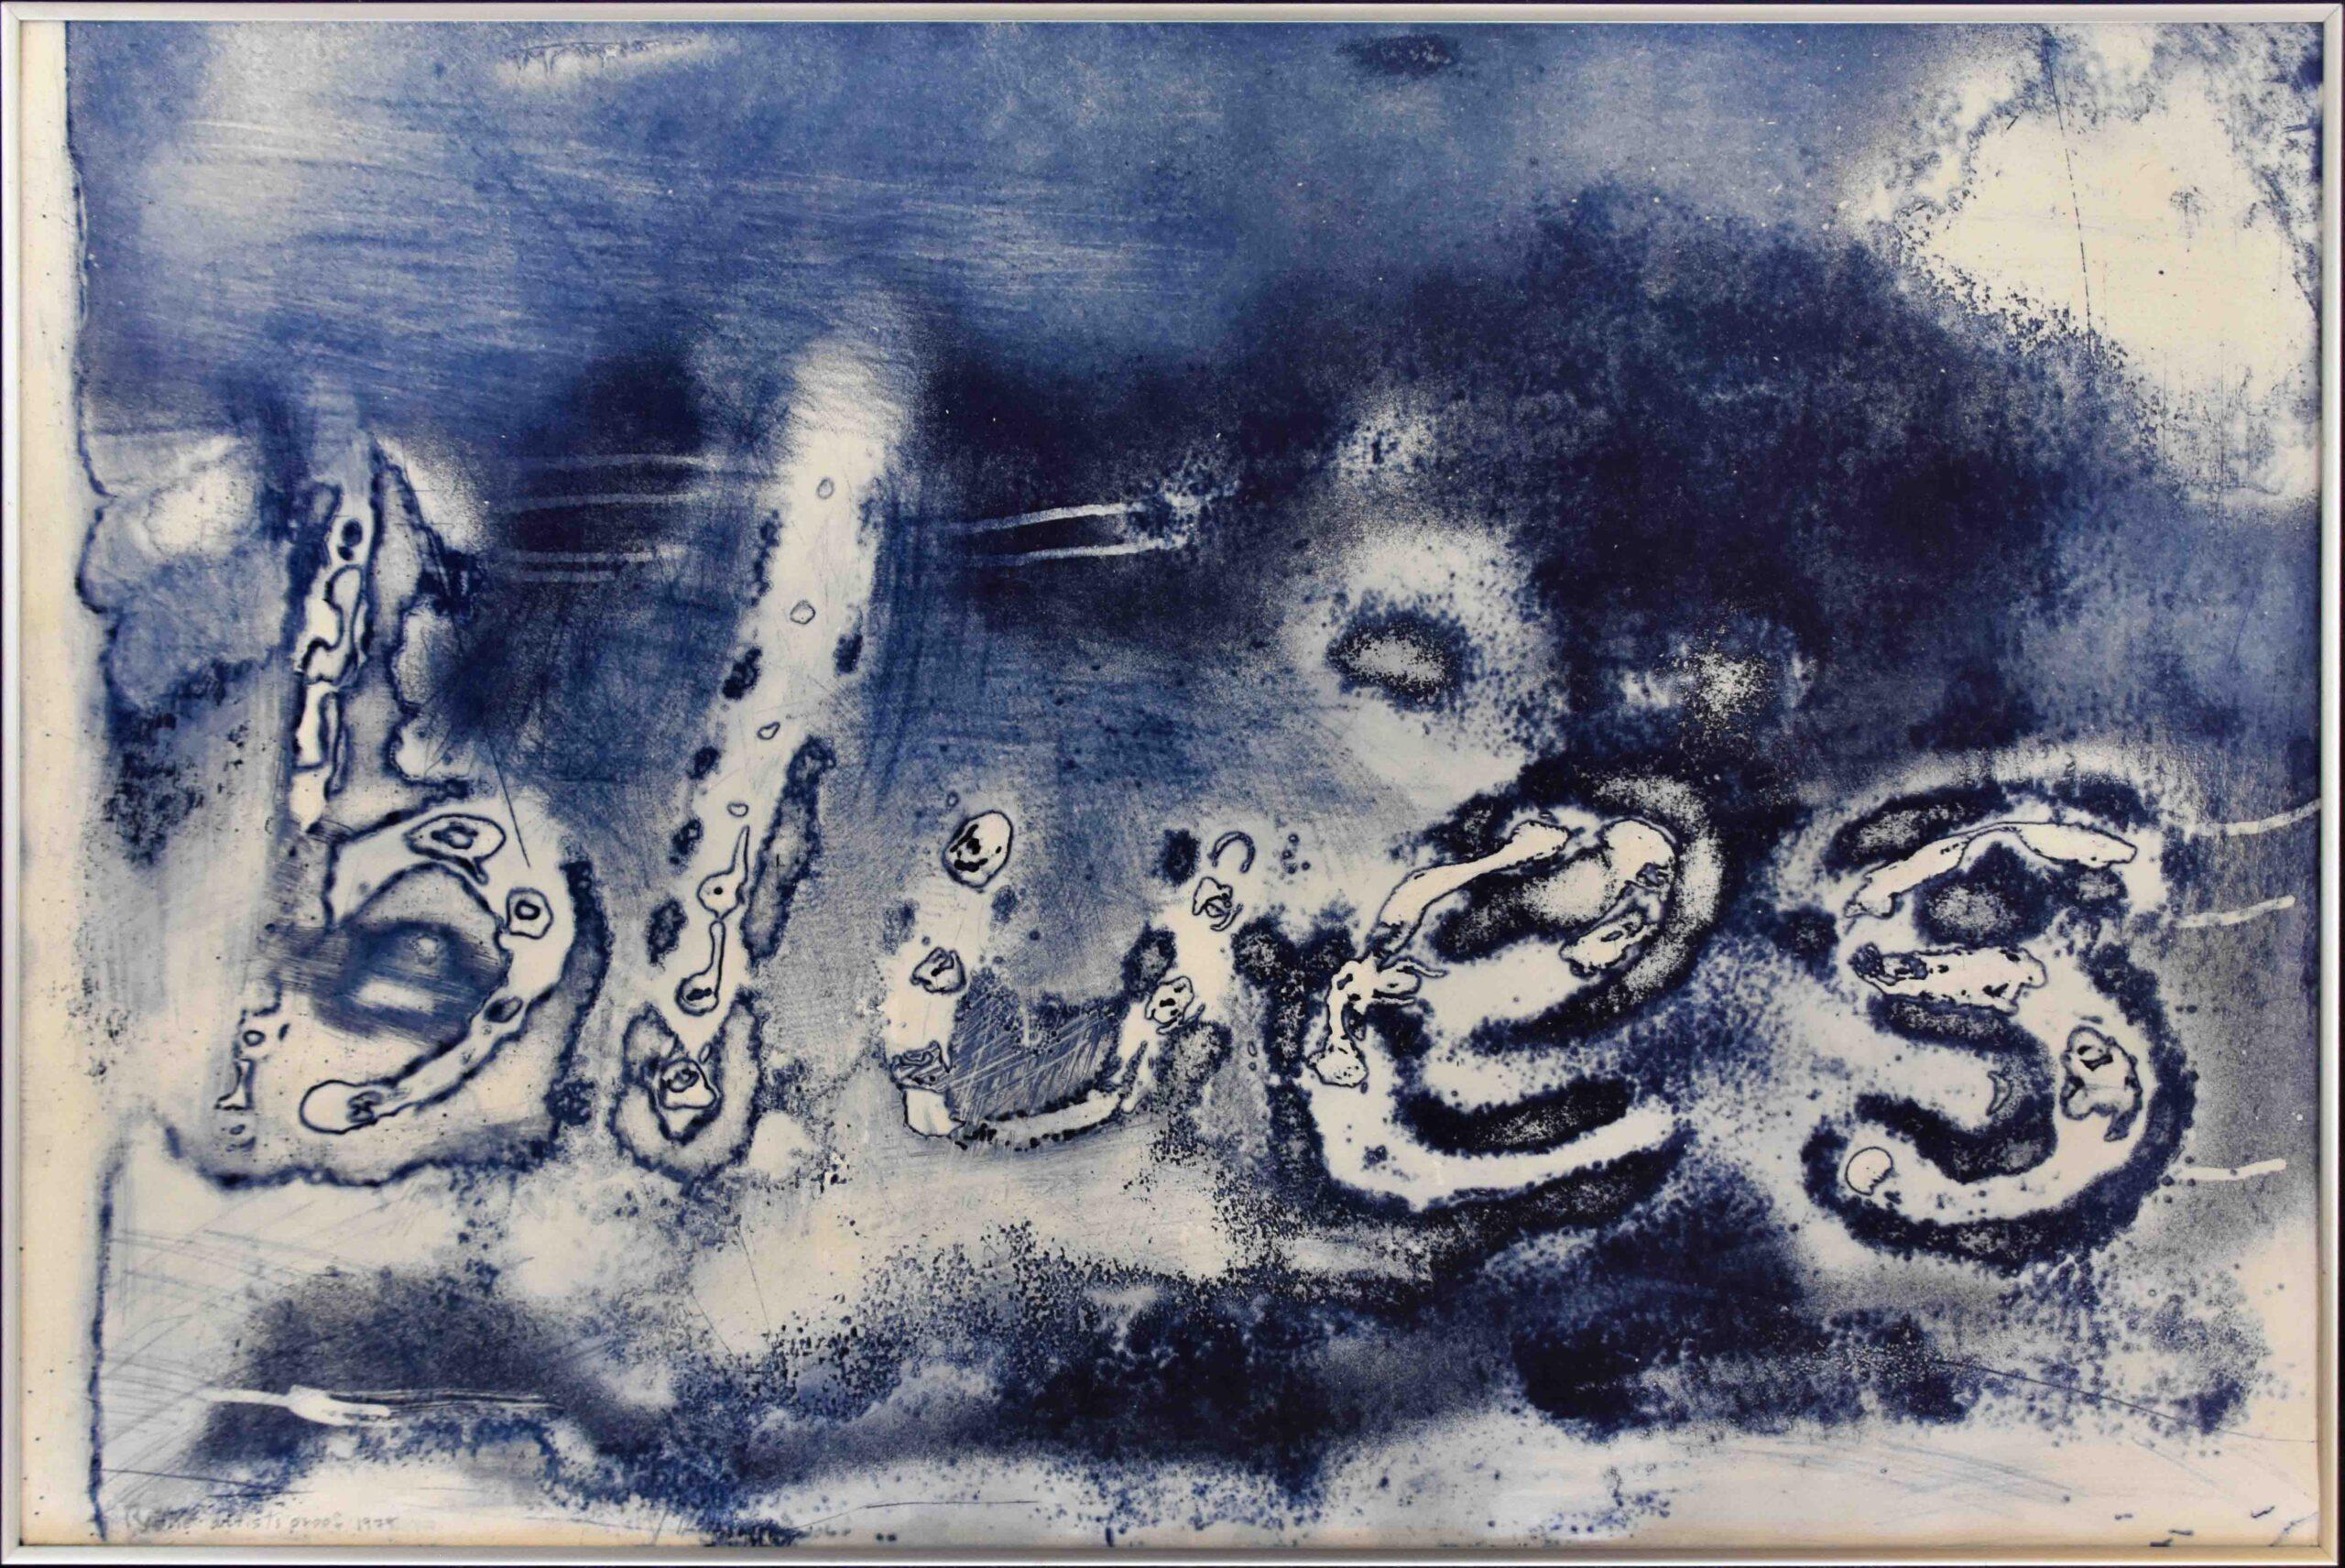 1975 blues-intaglio on rag paper 24x36in by Raymond Potié